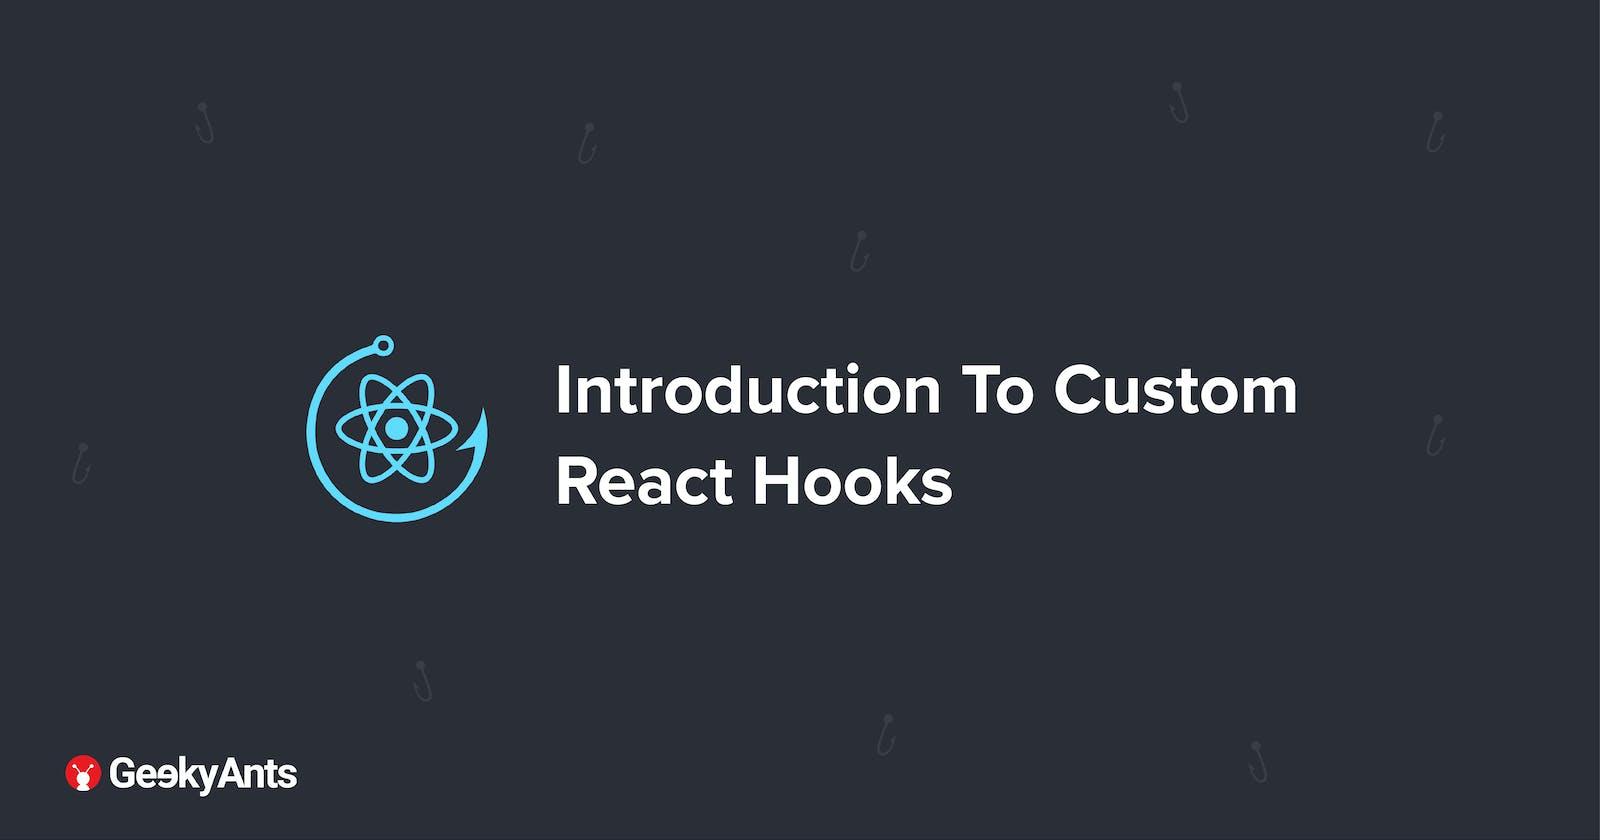 Introduction To Custom React Hooks